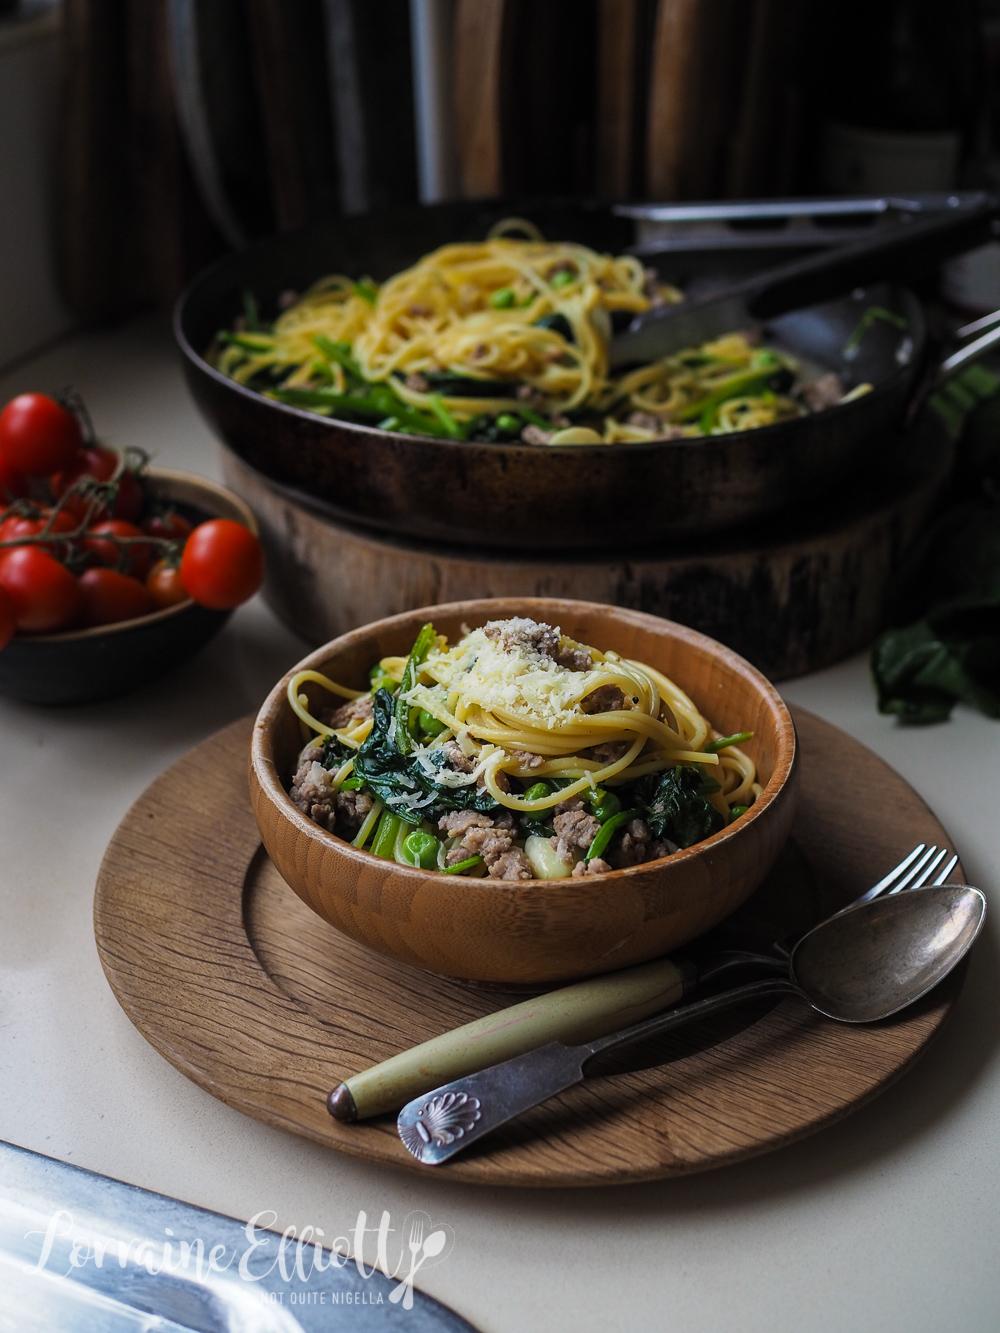 Italian Sausage, Spinach & Pea Spaghetti